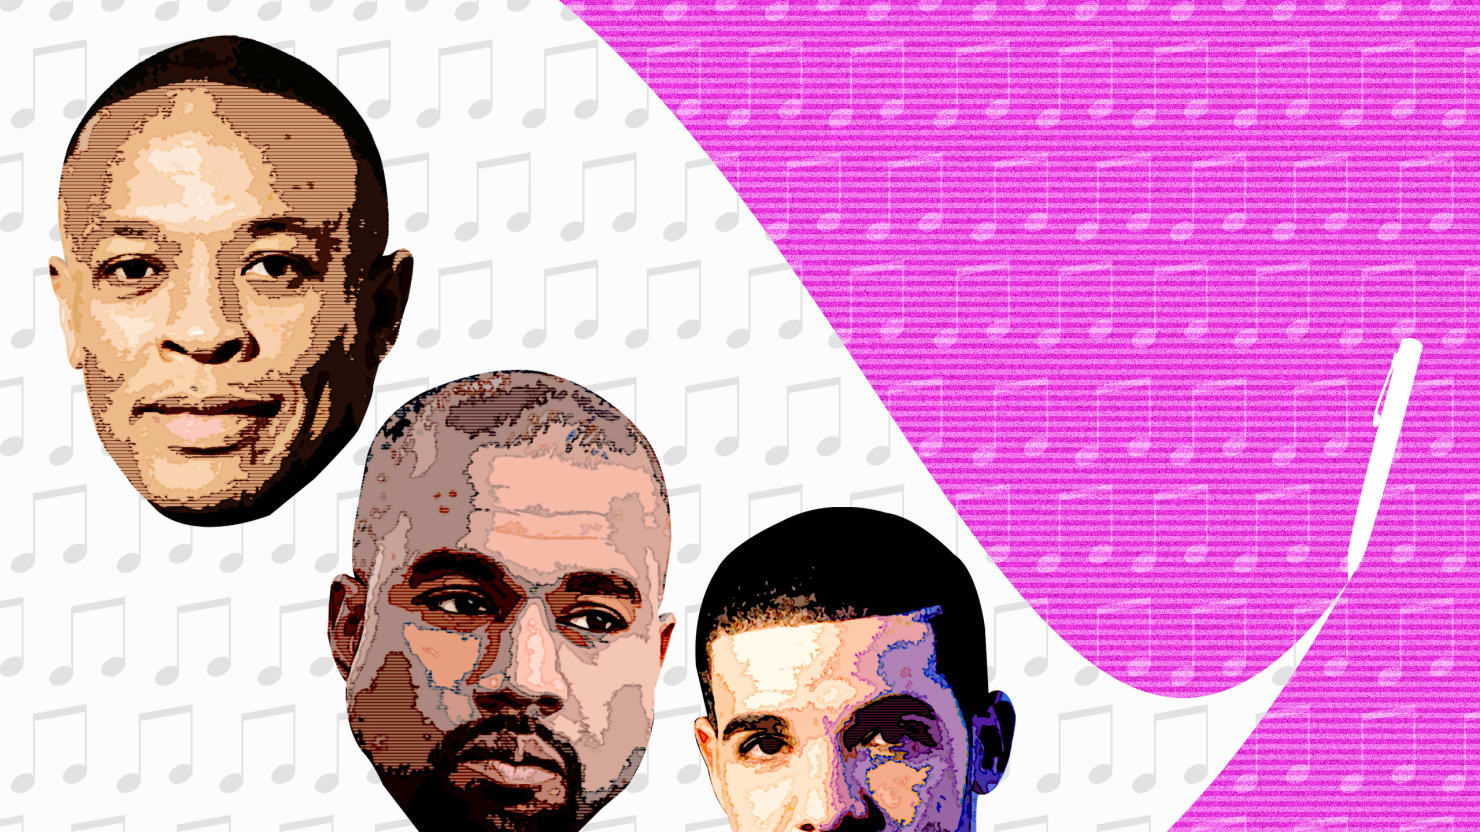 Drake admissions essay